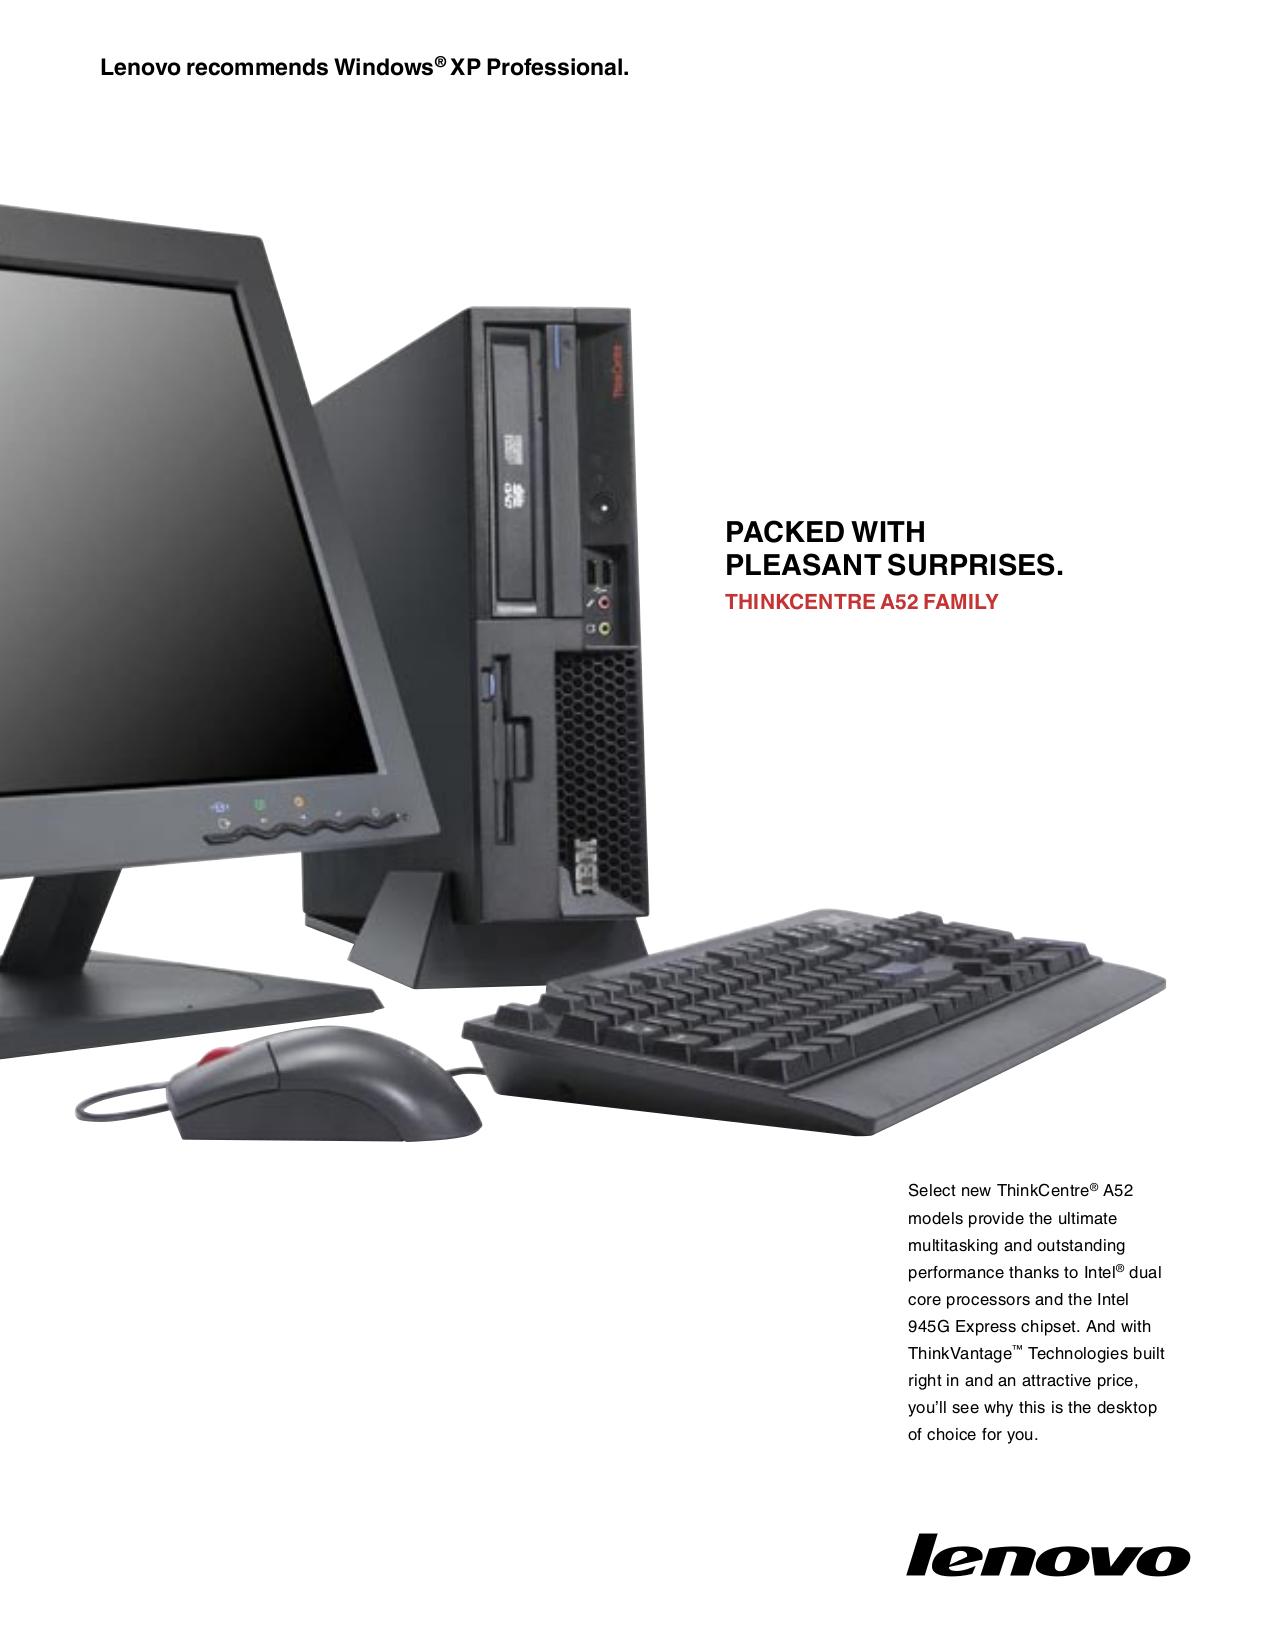 pdf for Lenovo Desktop ThinkCentre A52 8296 manual